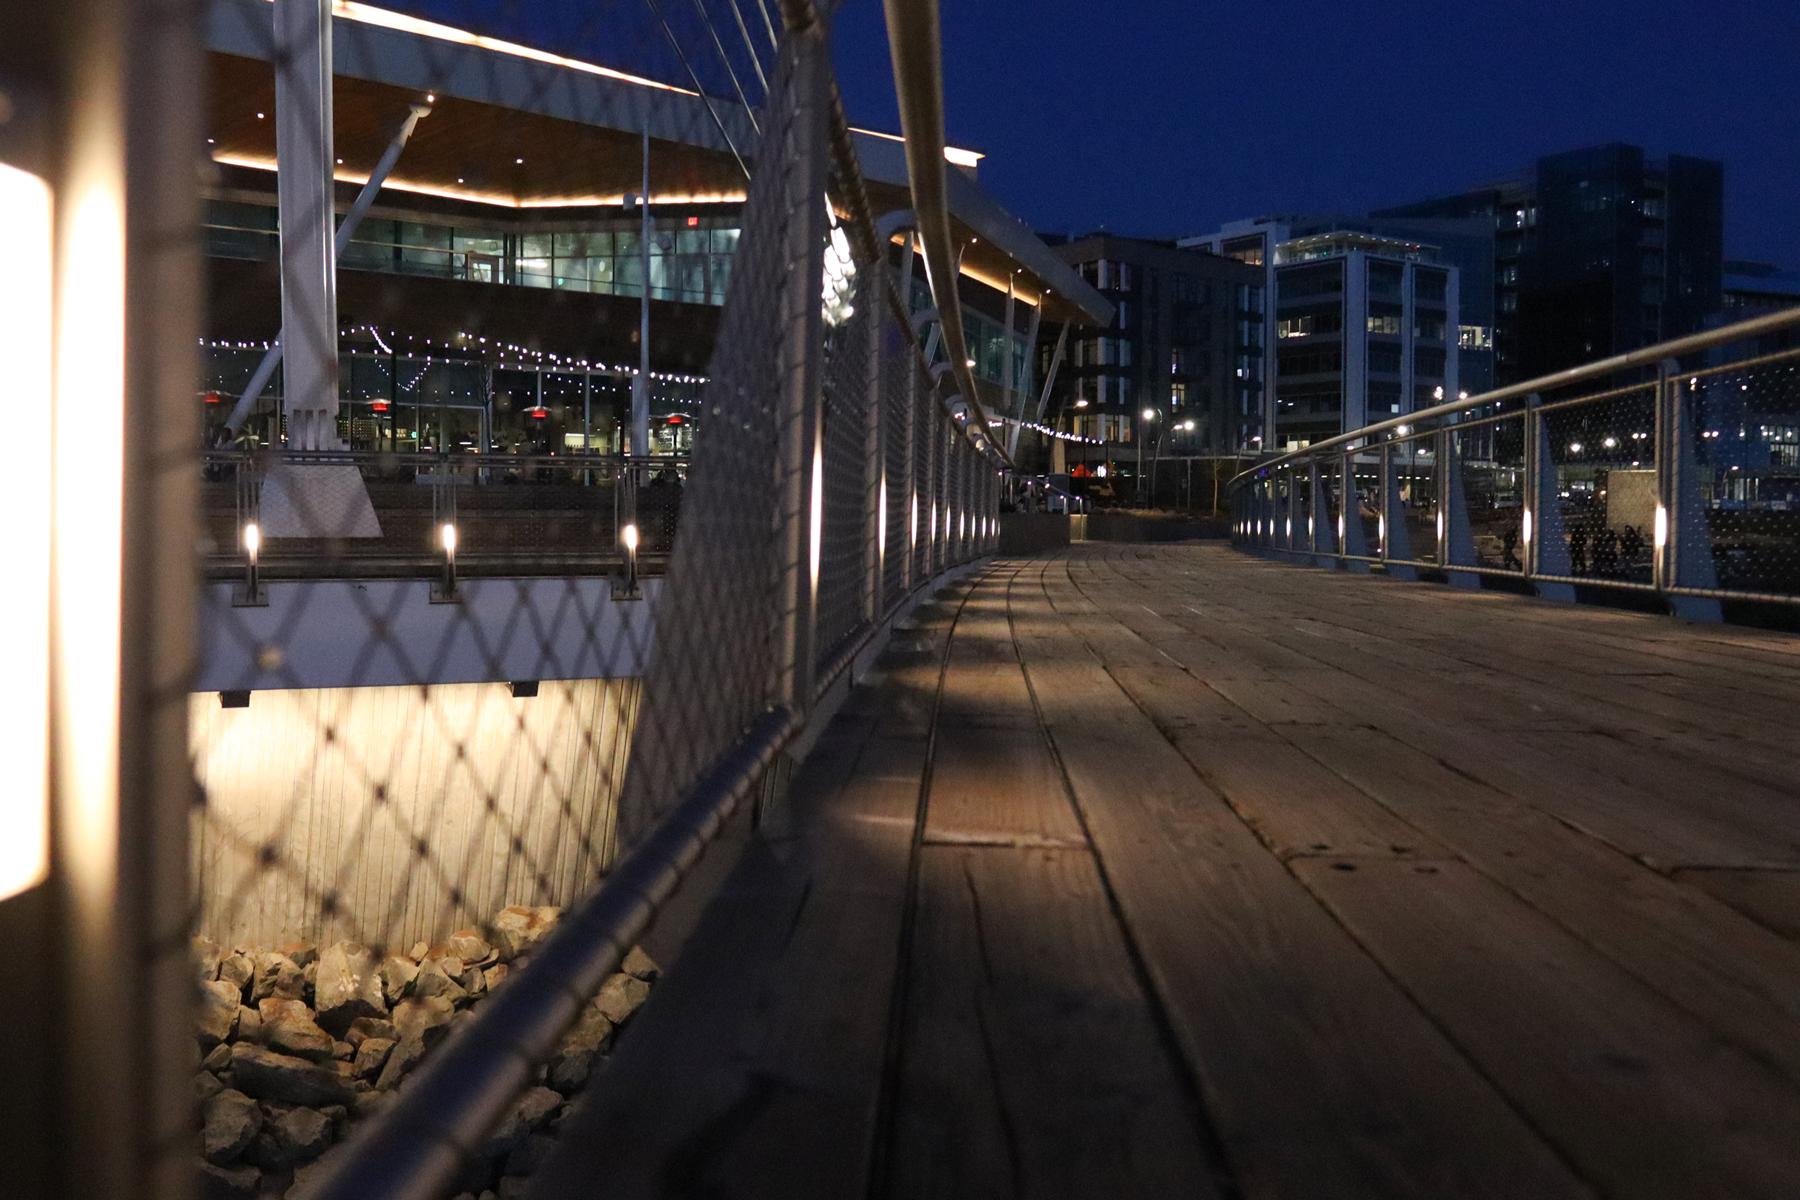 Commercial electrical sidewalk illumination